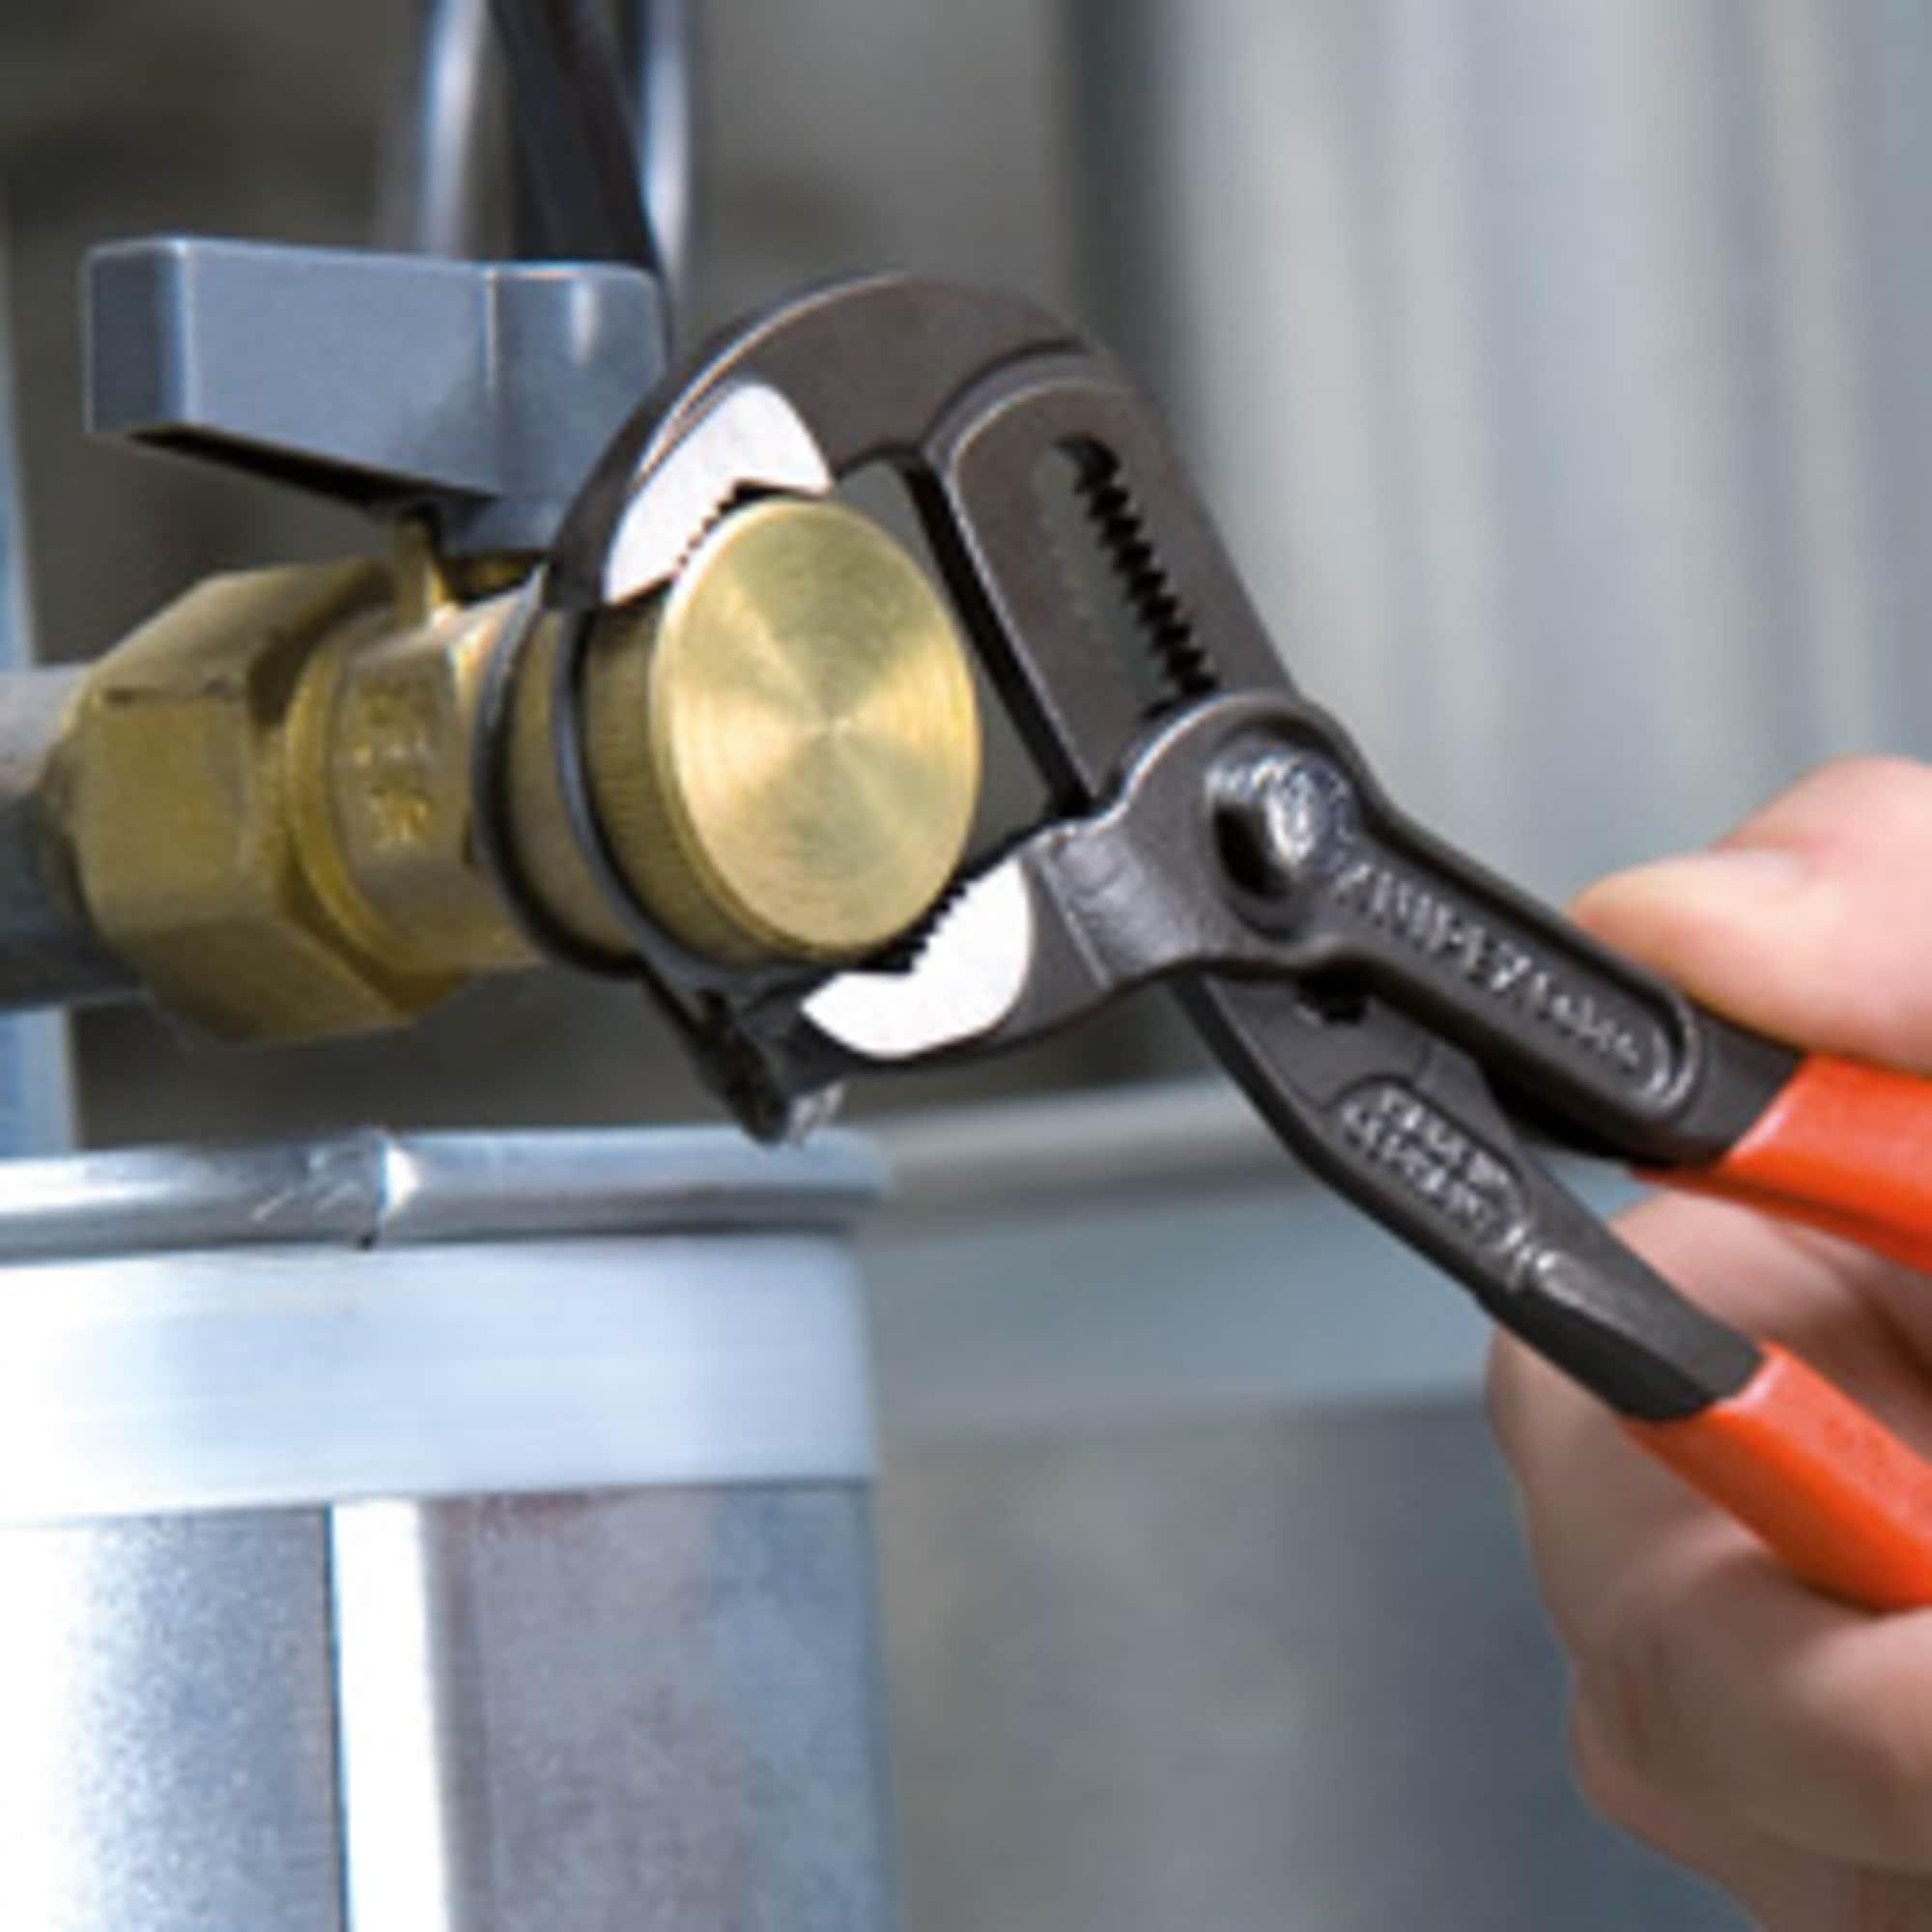 Knipex Rohr- / Wasserpumpen-Zange Cobra 87 01 180, 180mm